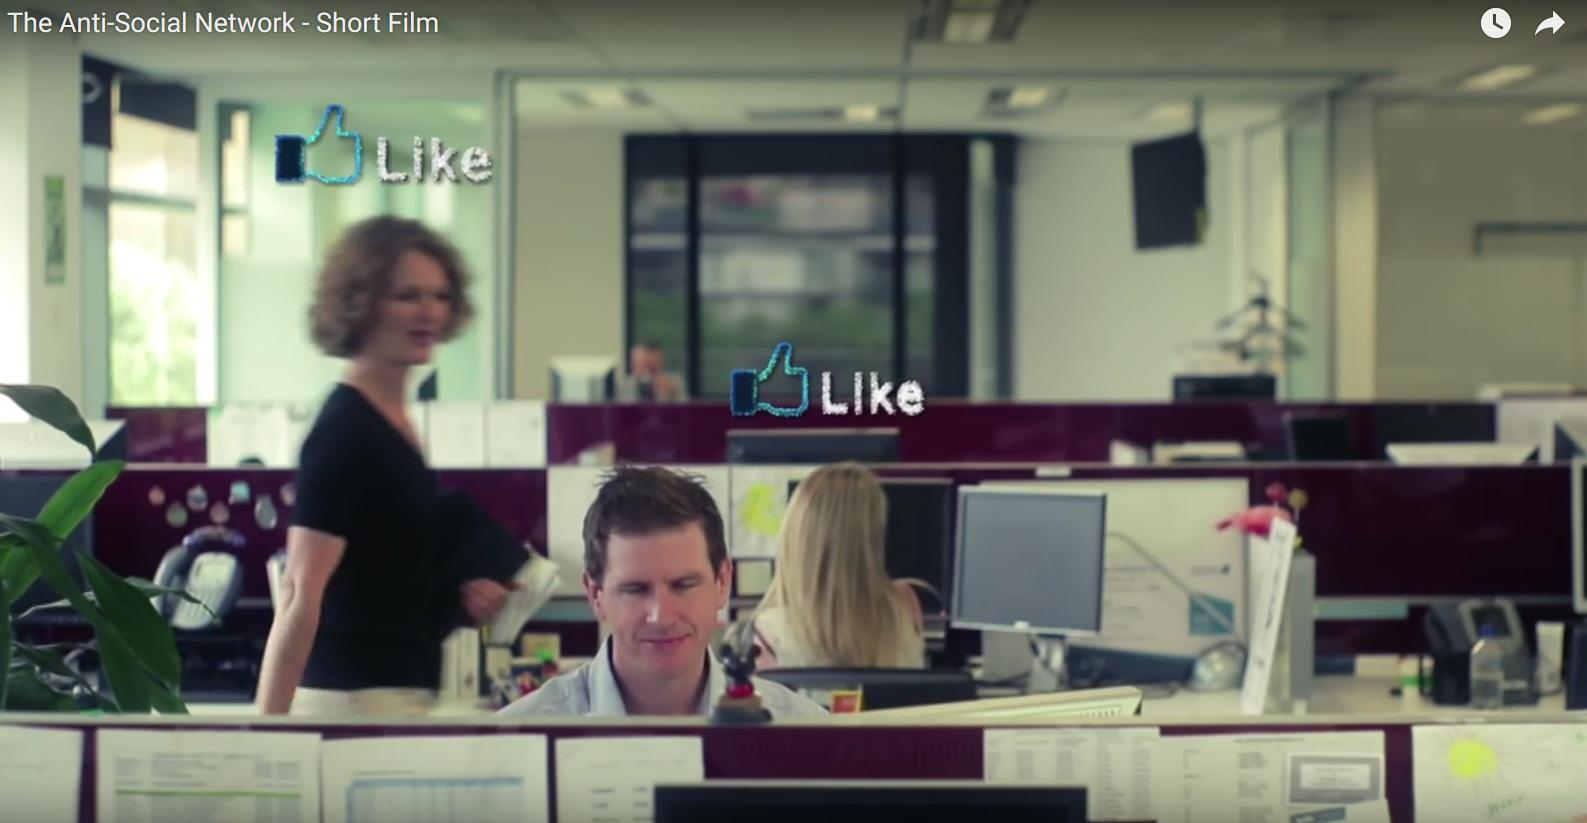 The Anti-Social Network: ชีวิตจริง – ไม่ใช่ -ชีวิตออนไลน์